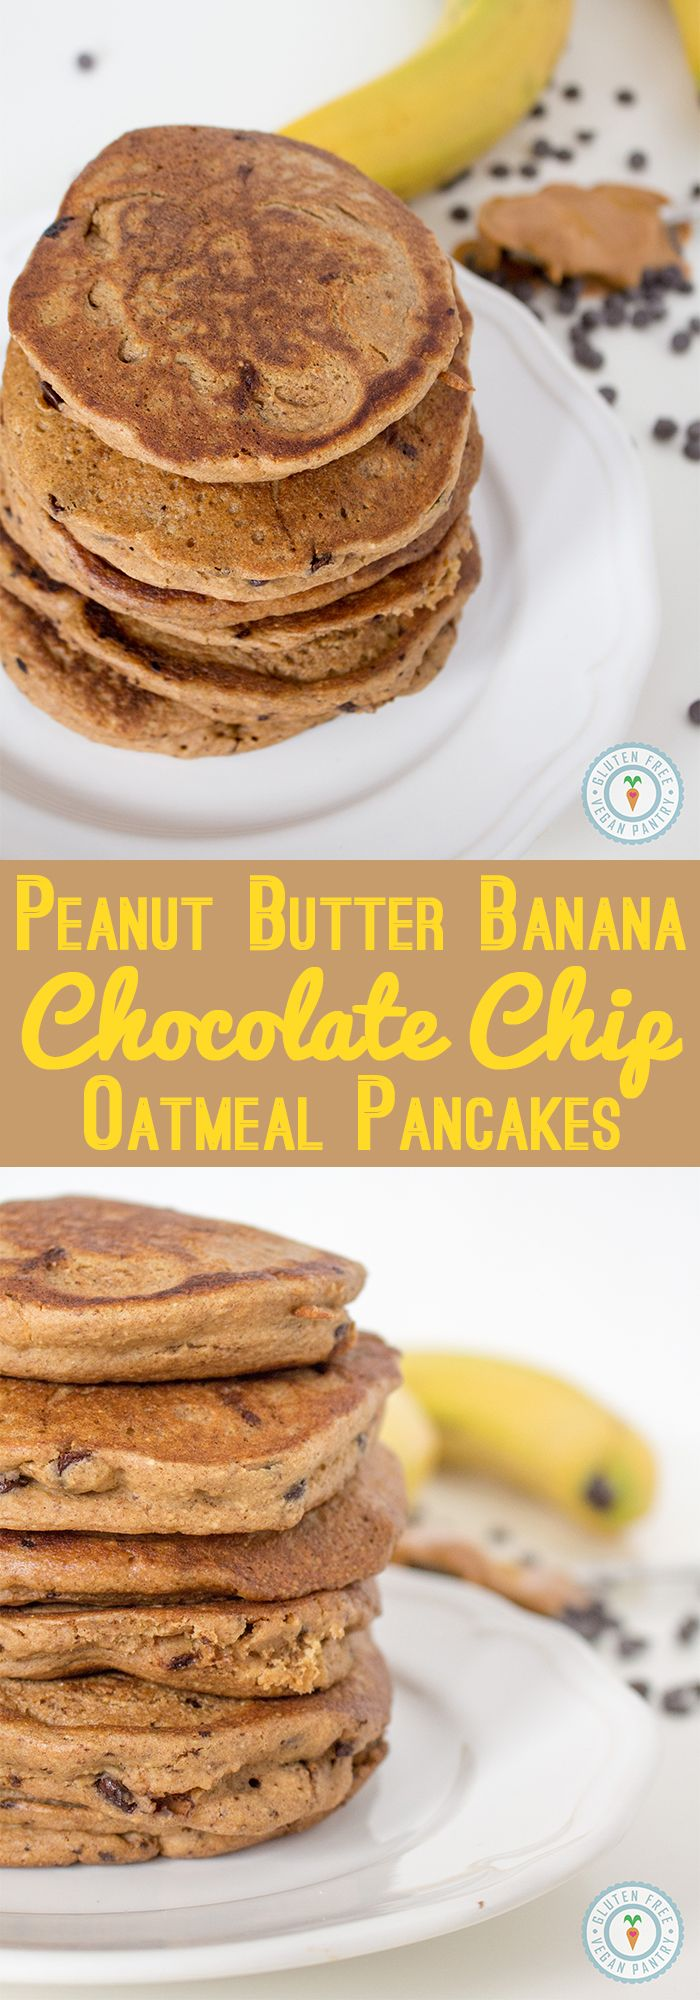 Vegan and Gluten Free, these Peanut Butter Banana Chocolate Chip Oatmeal Pancakes are a 5-star breakfast winner! glutenfreeveganpantry.com